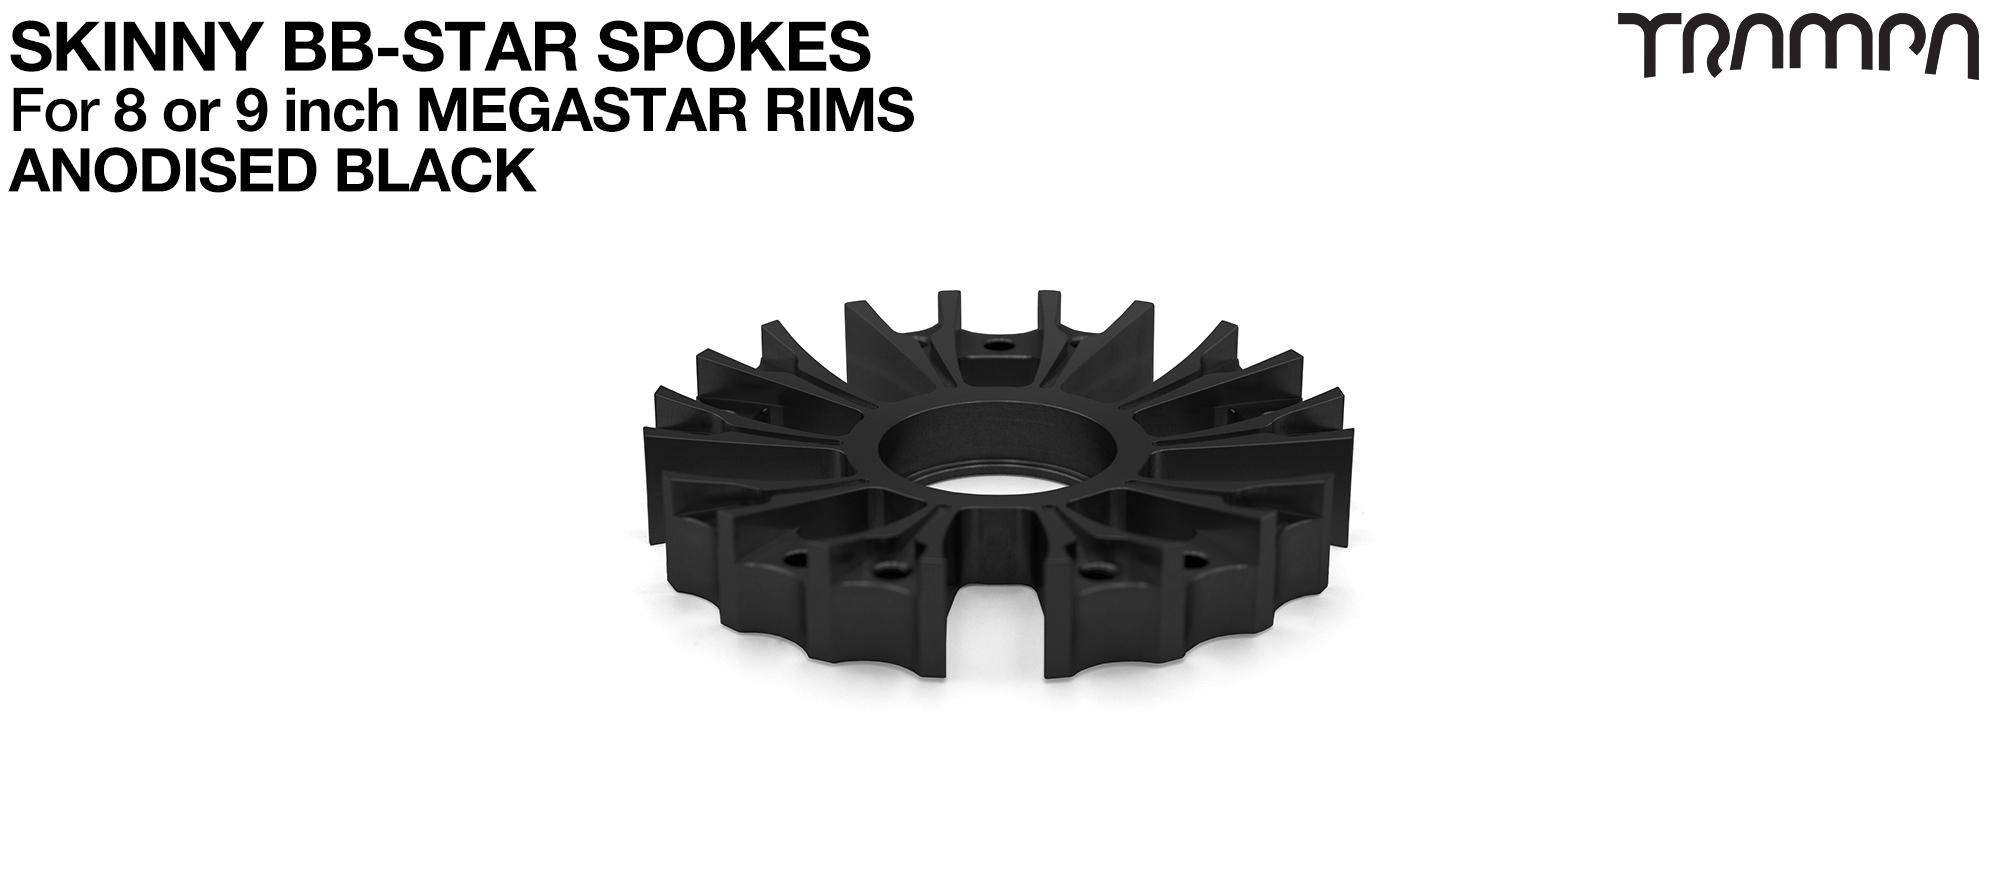 BB Star Spoke for 8 Inch DEEP-DISH MEGASTAR Rim - CNC Precision milled - BLACK